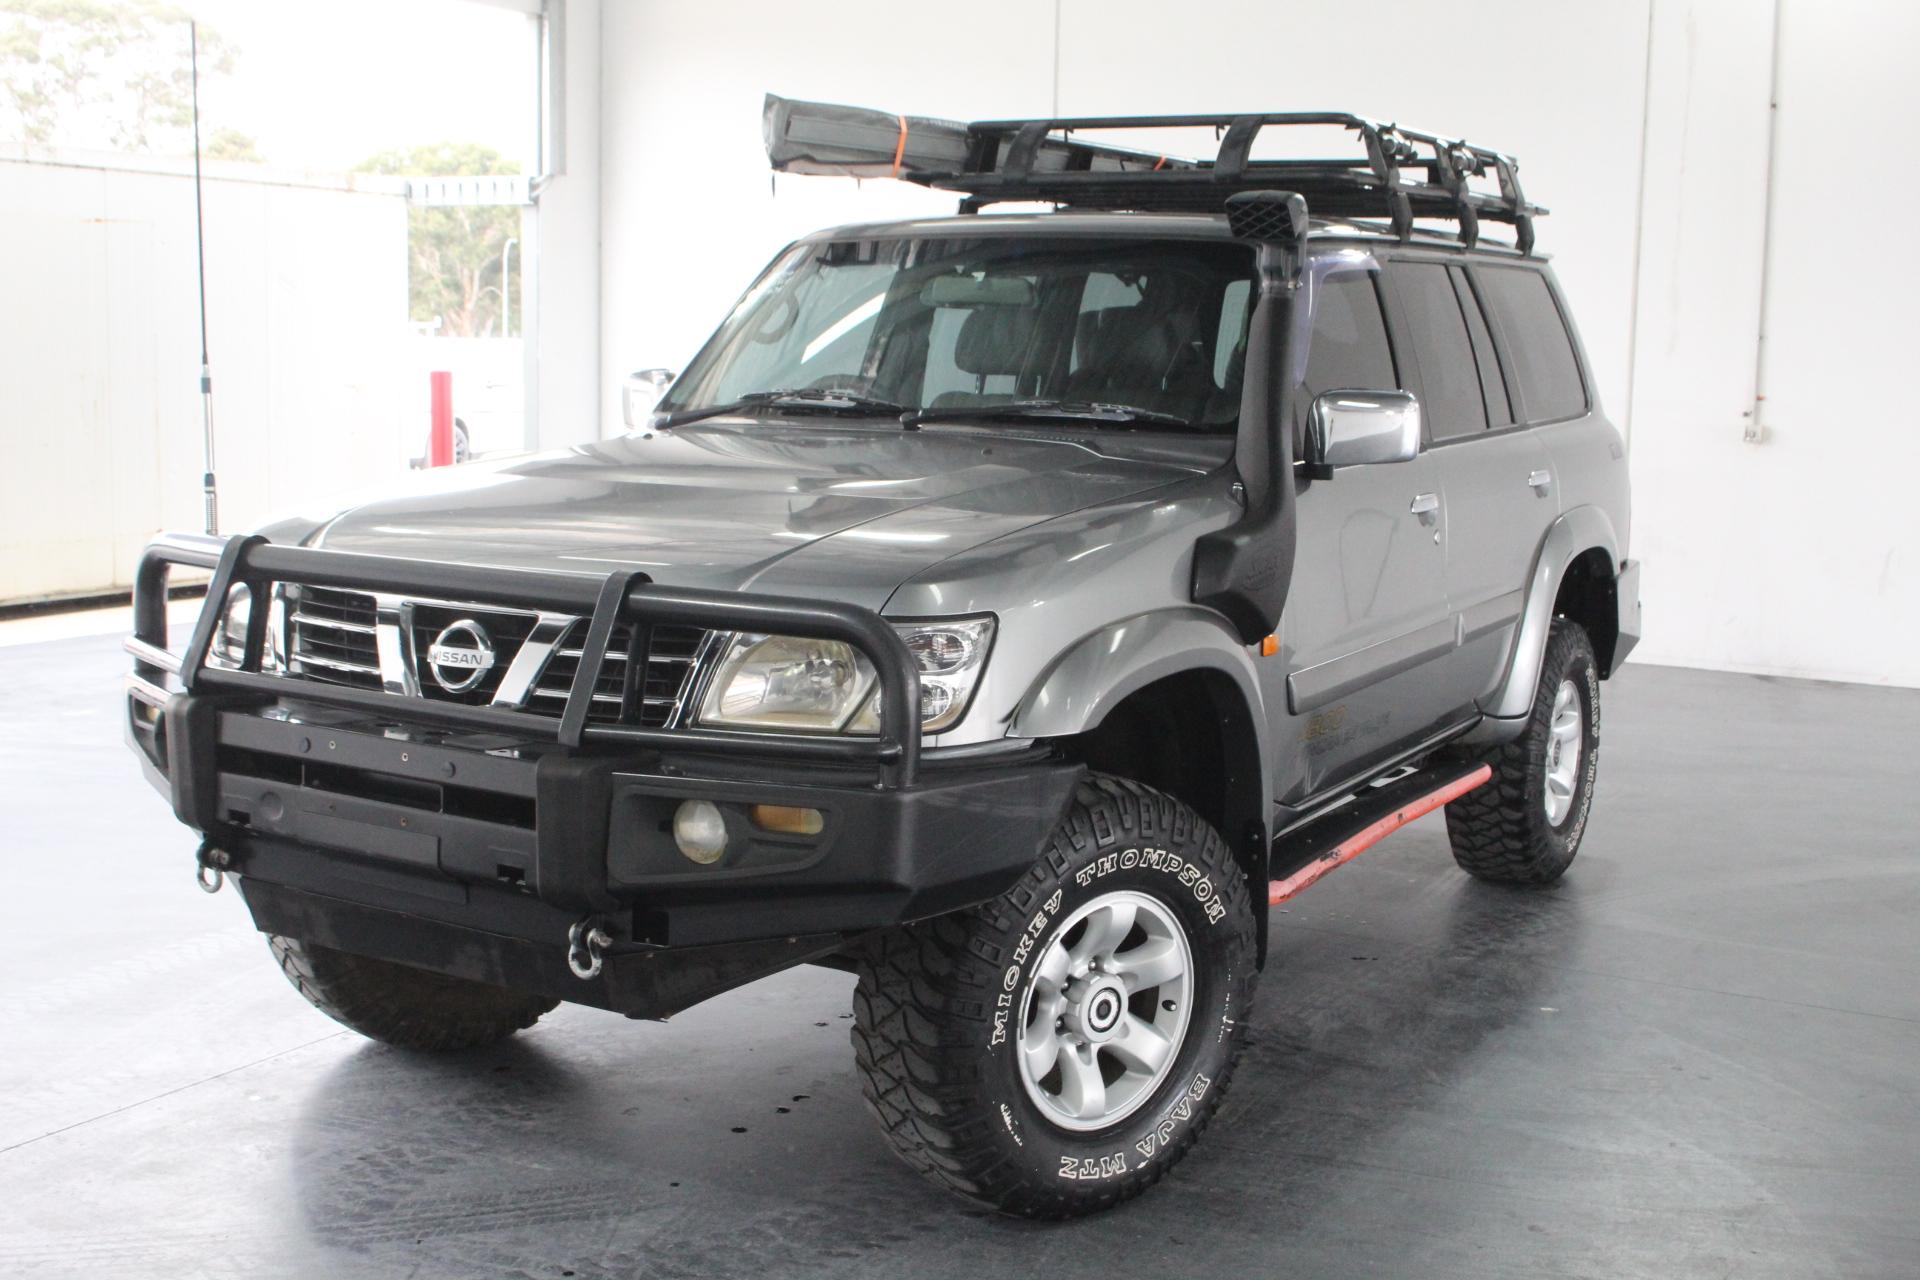 2002 Nissan Patrol Ti (4x4) GU II Automatic 7 Seats Wagon (Dual Fuel)